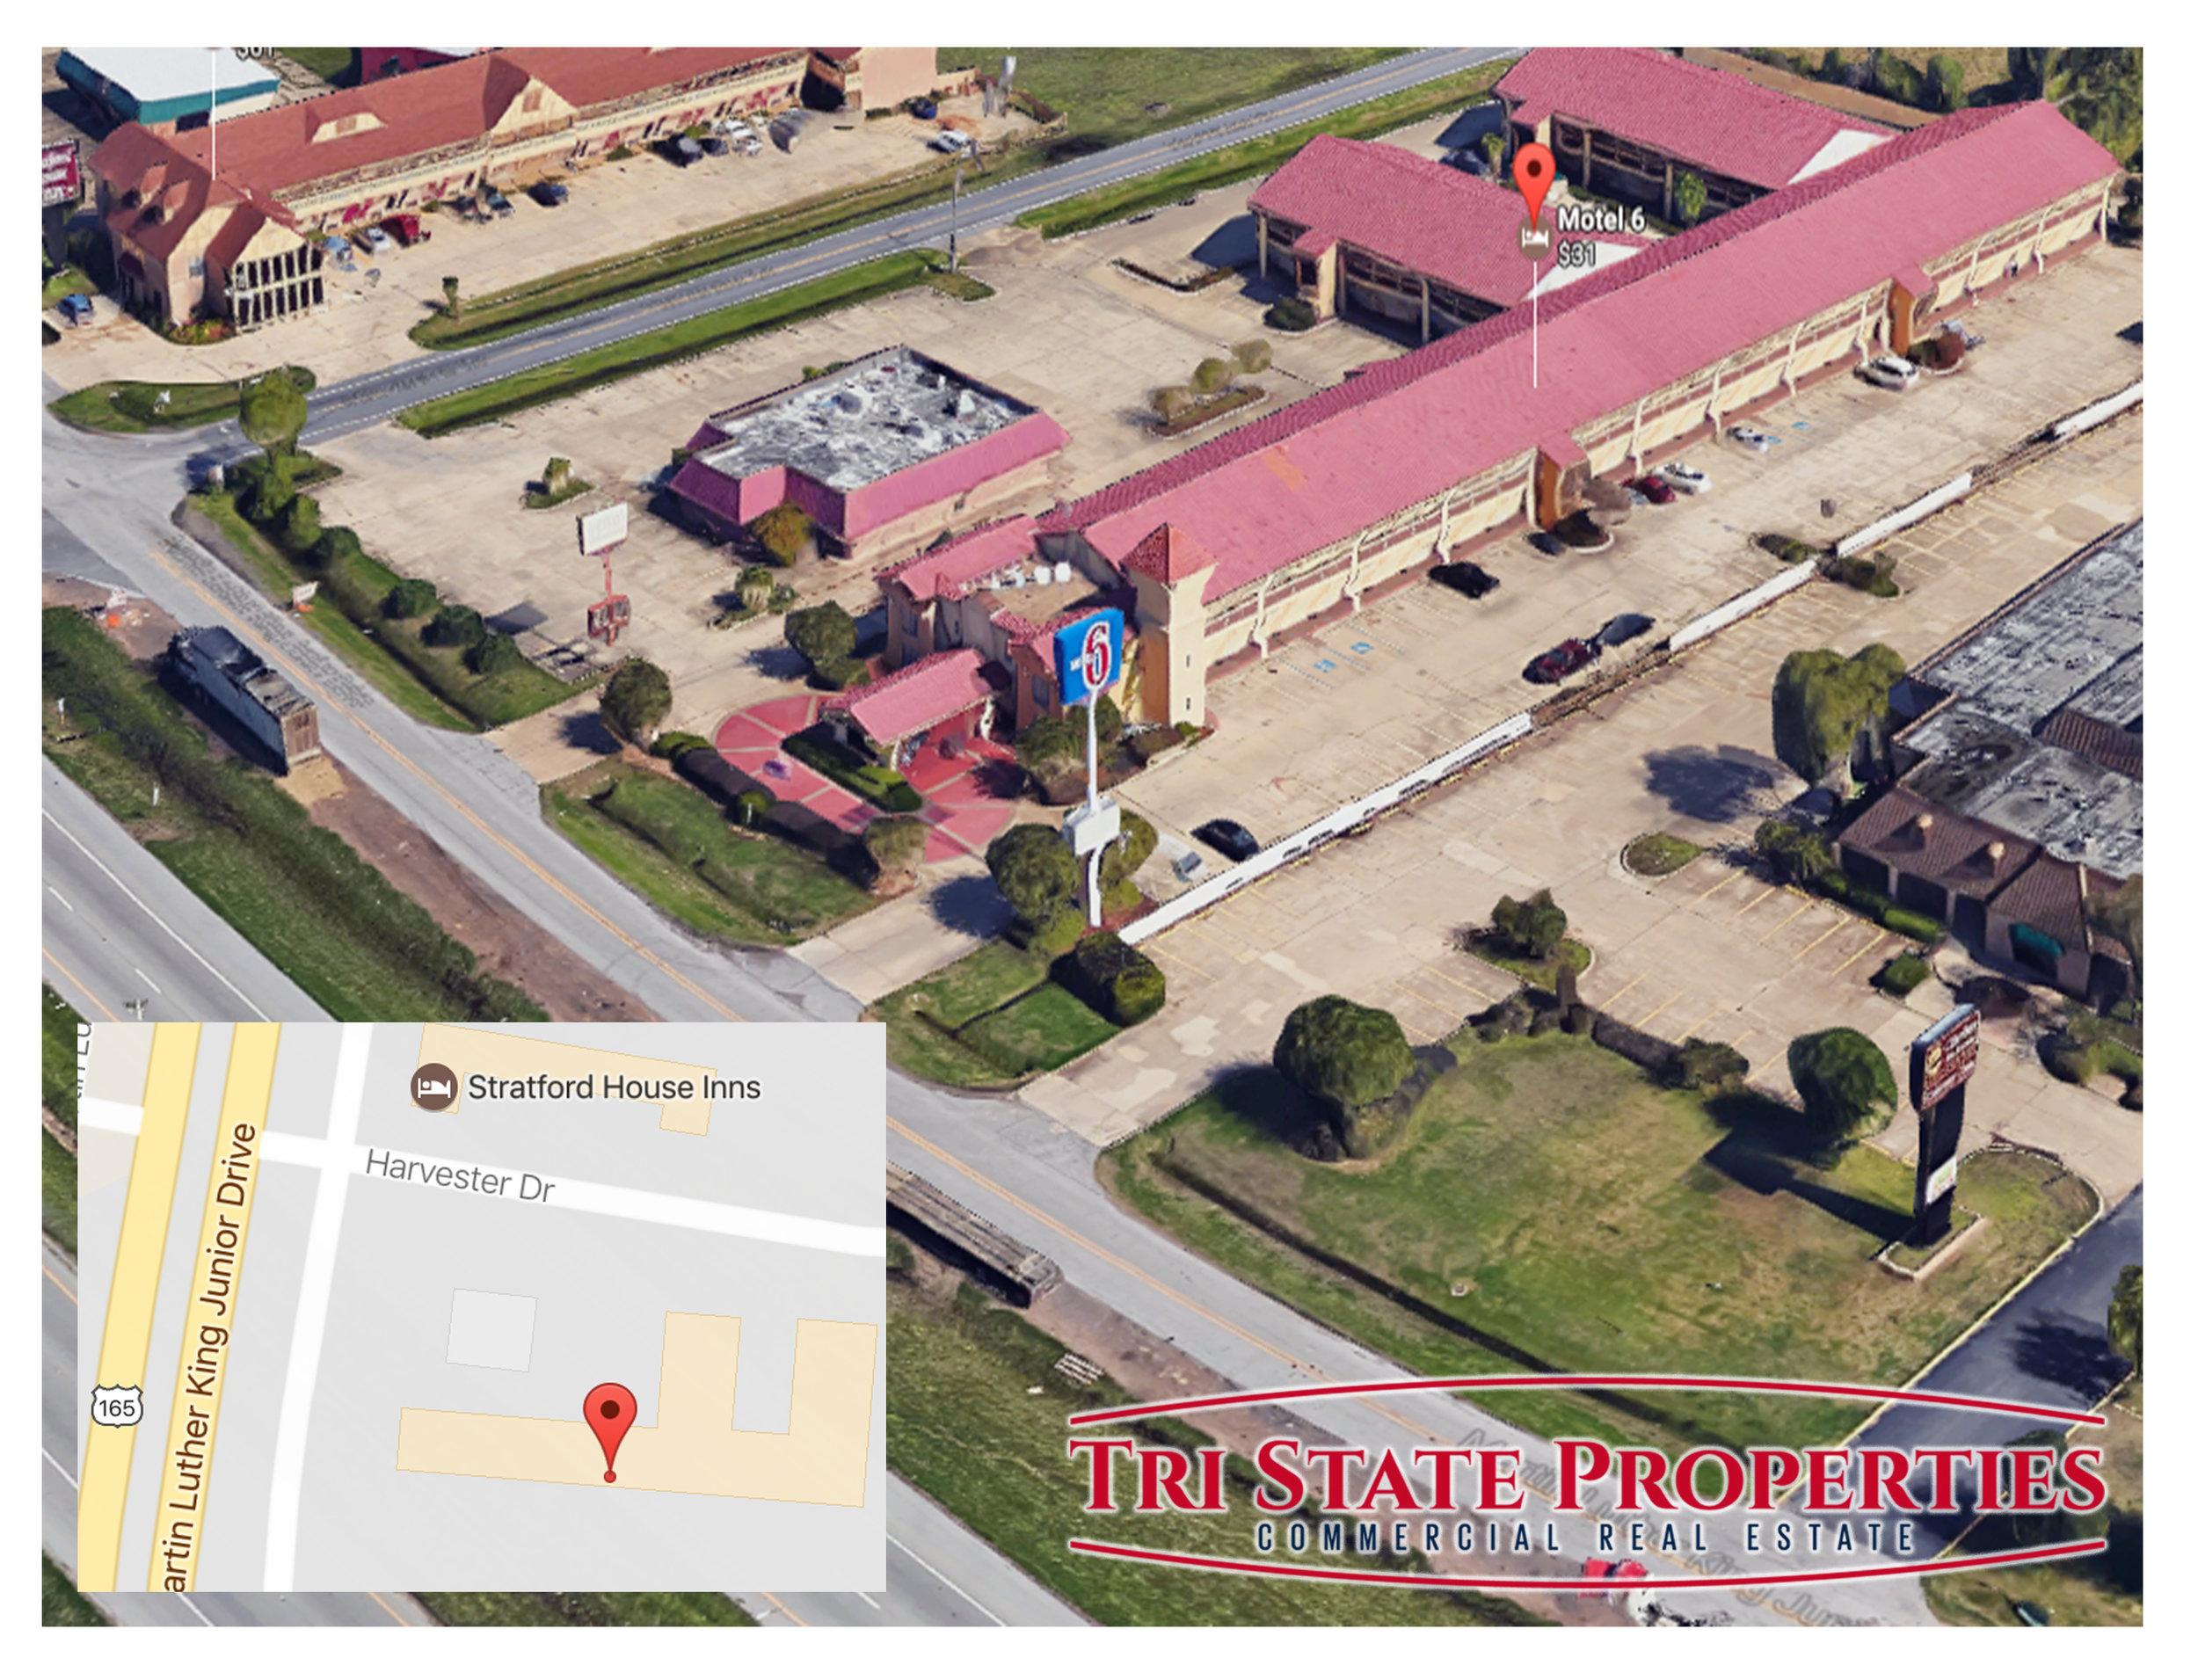 Motel 6 Monroe Commercial Real Estate | Tri State Properties Ryan Roark